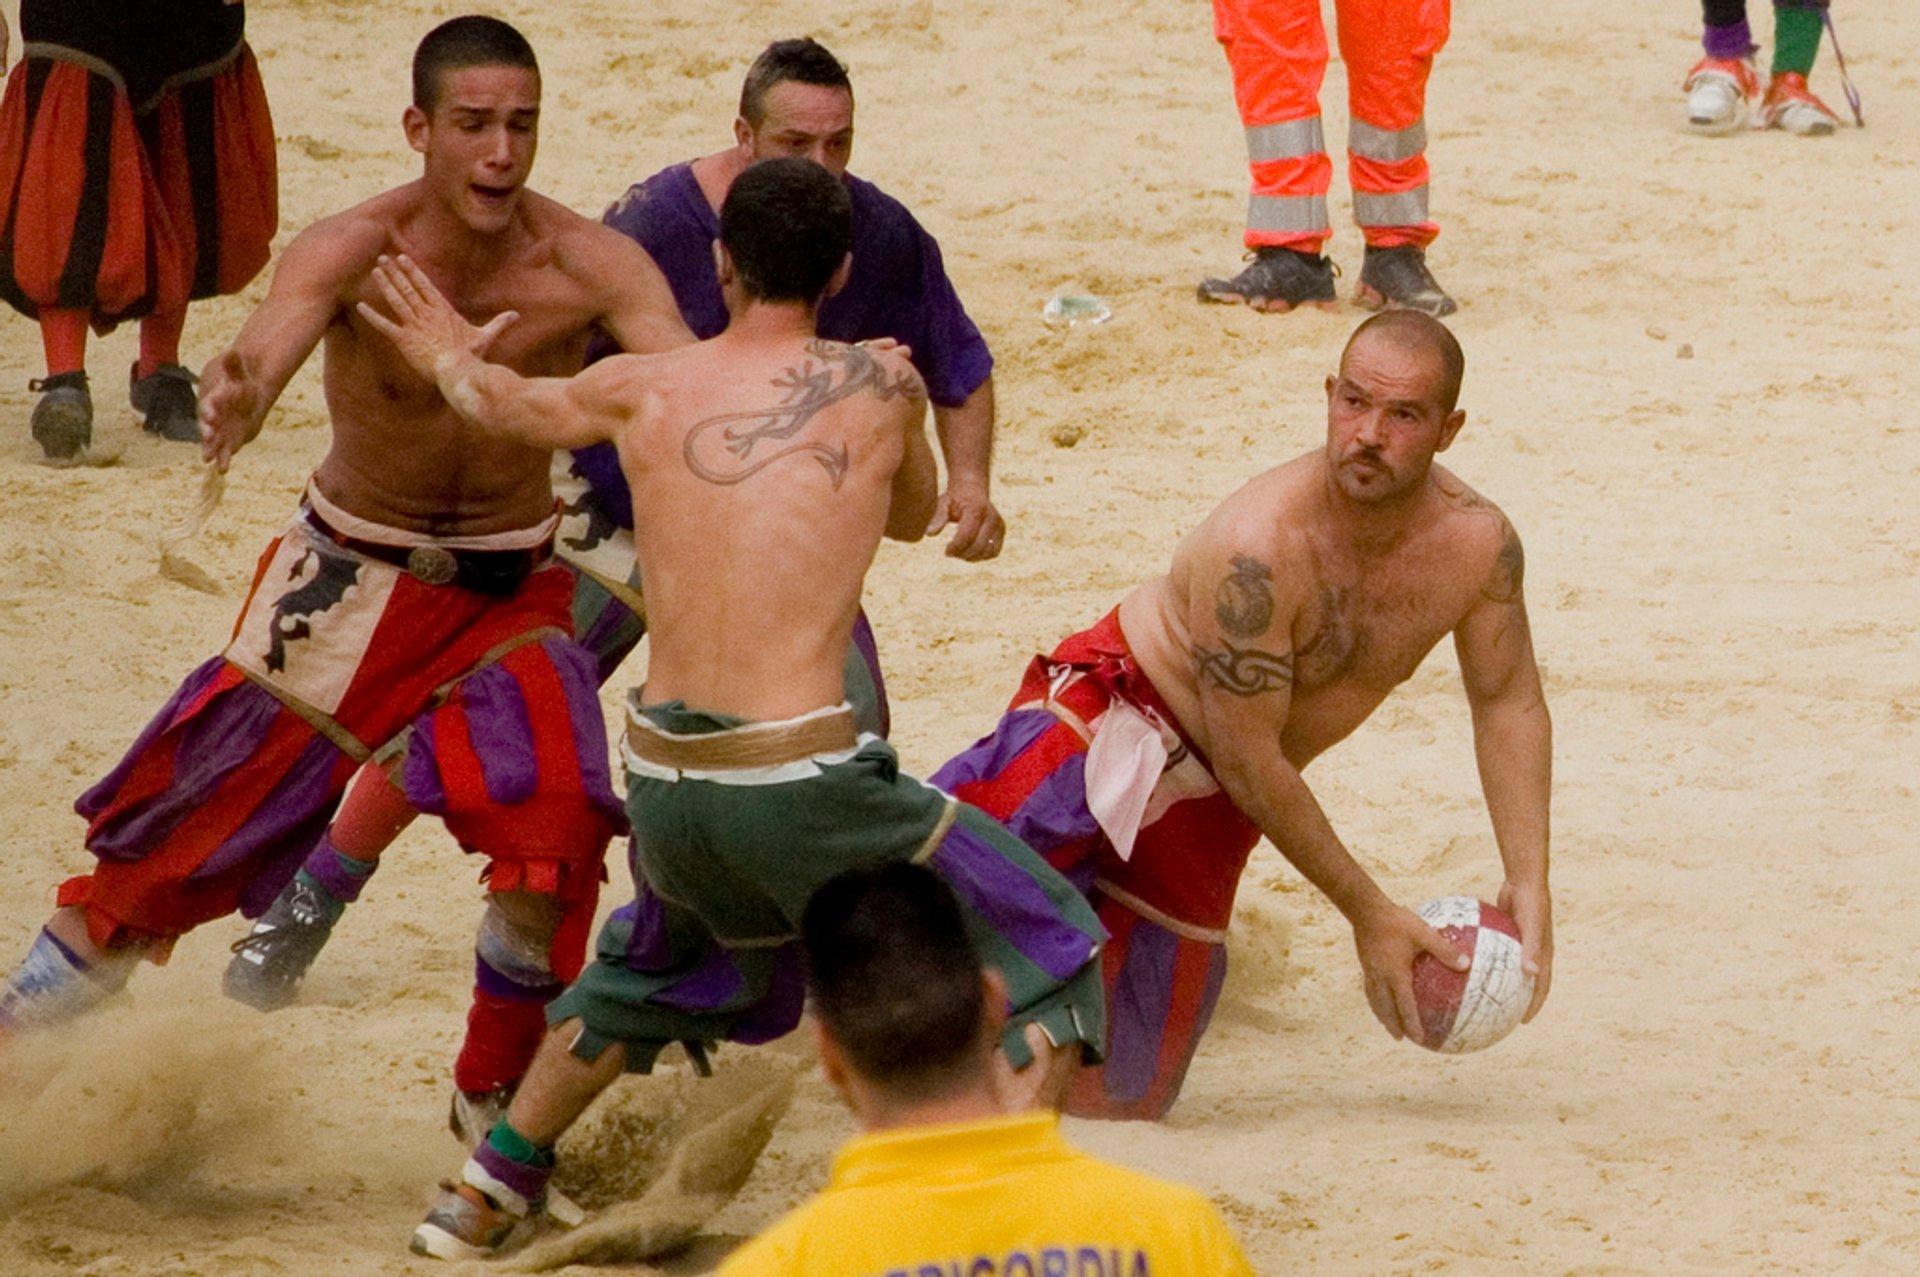 Calcio Storico in Florence - Best Season 2020